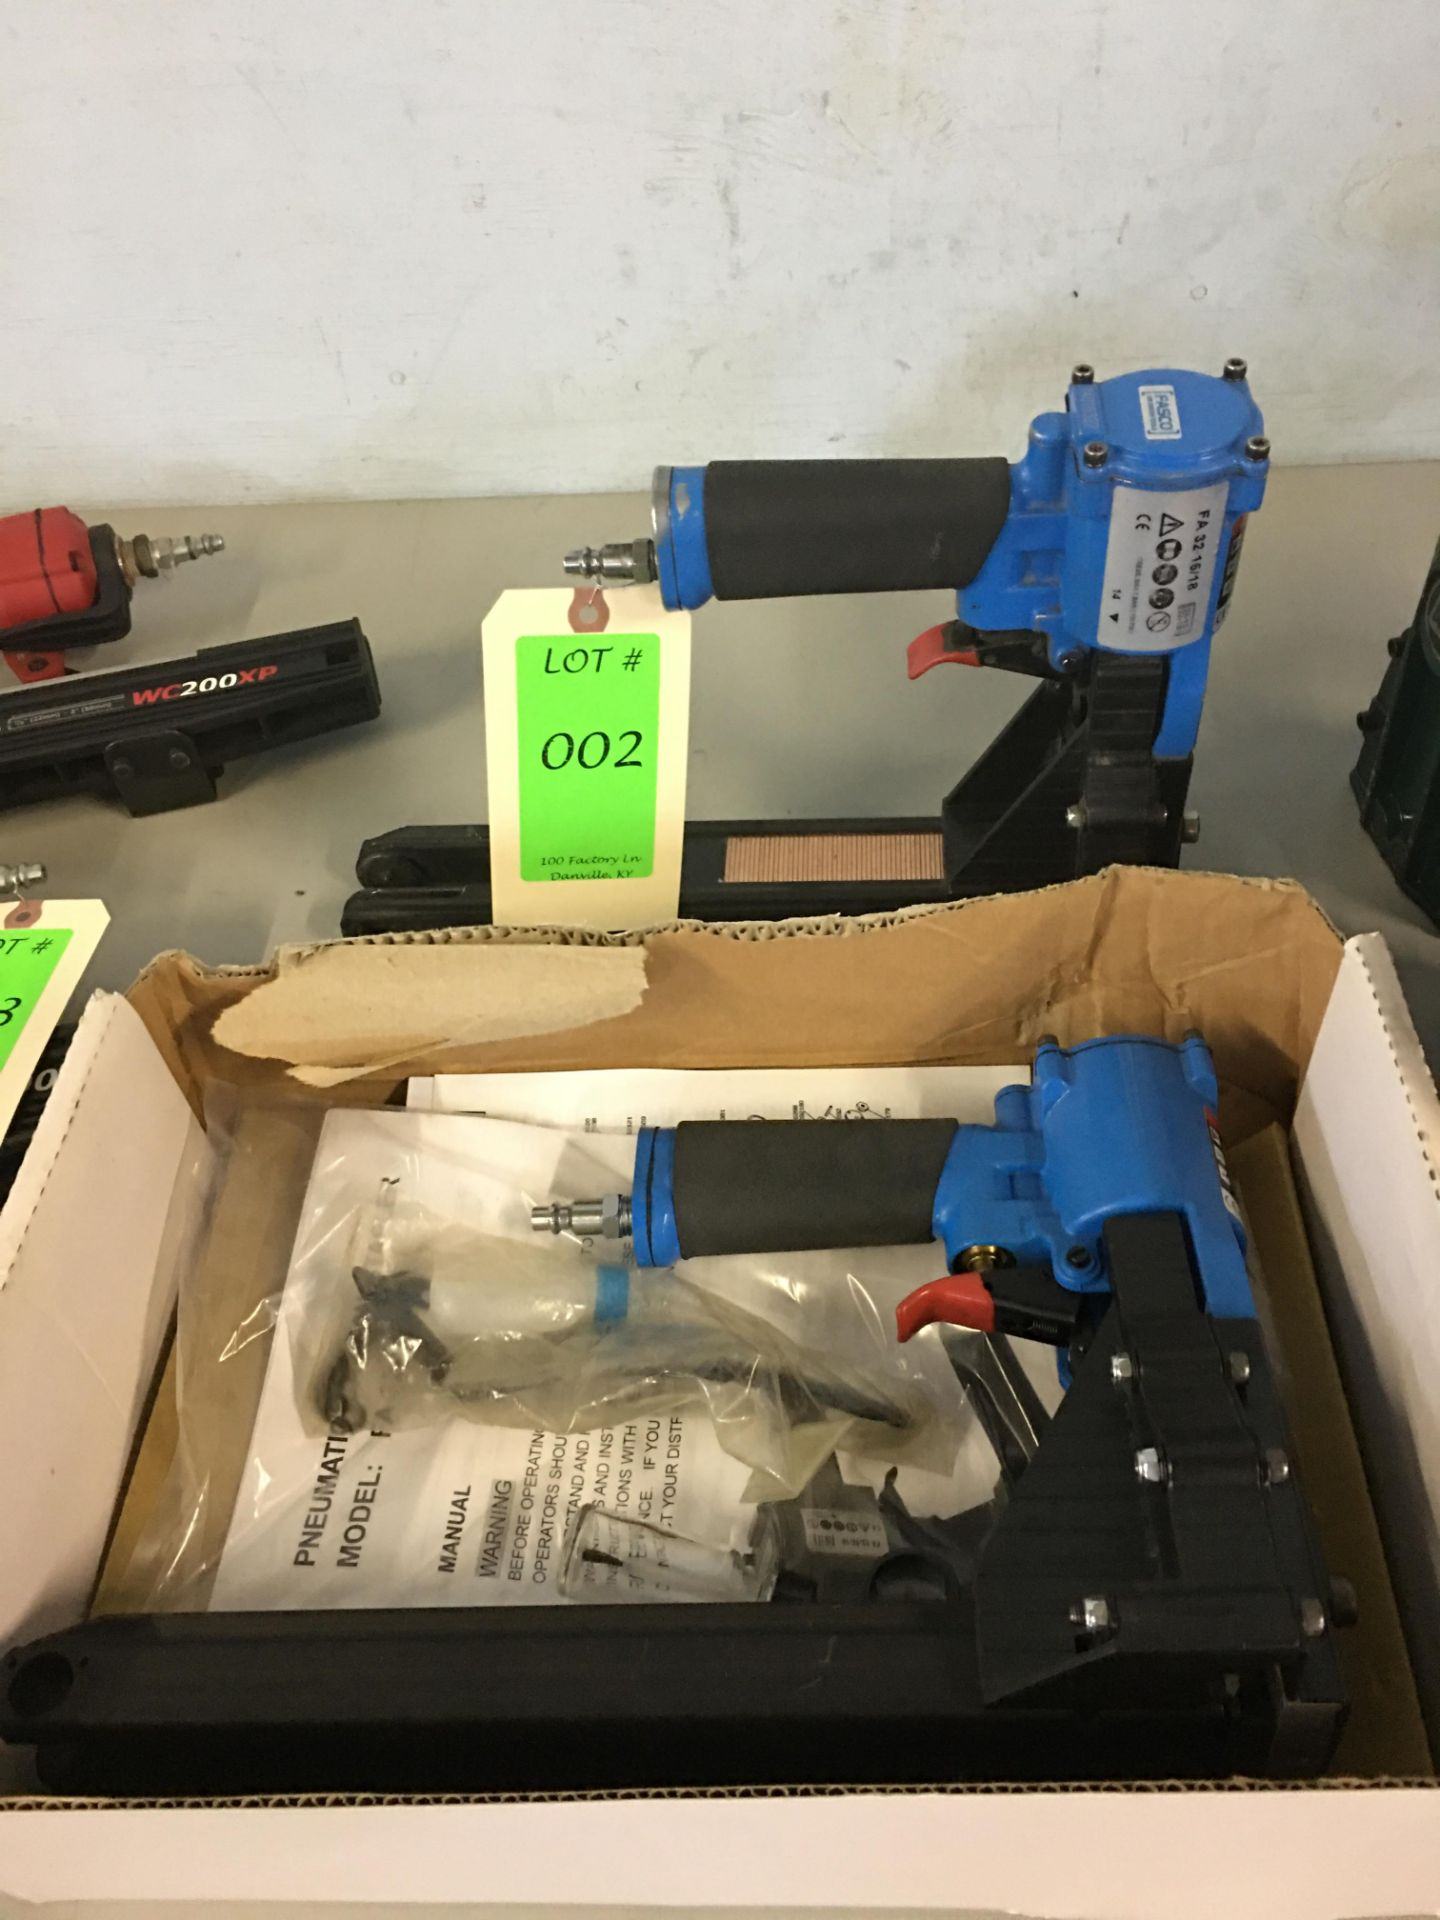 Two Fasco Pneumatic Staplers